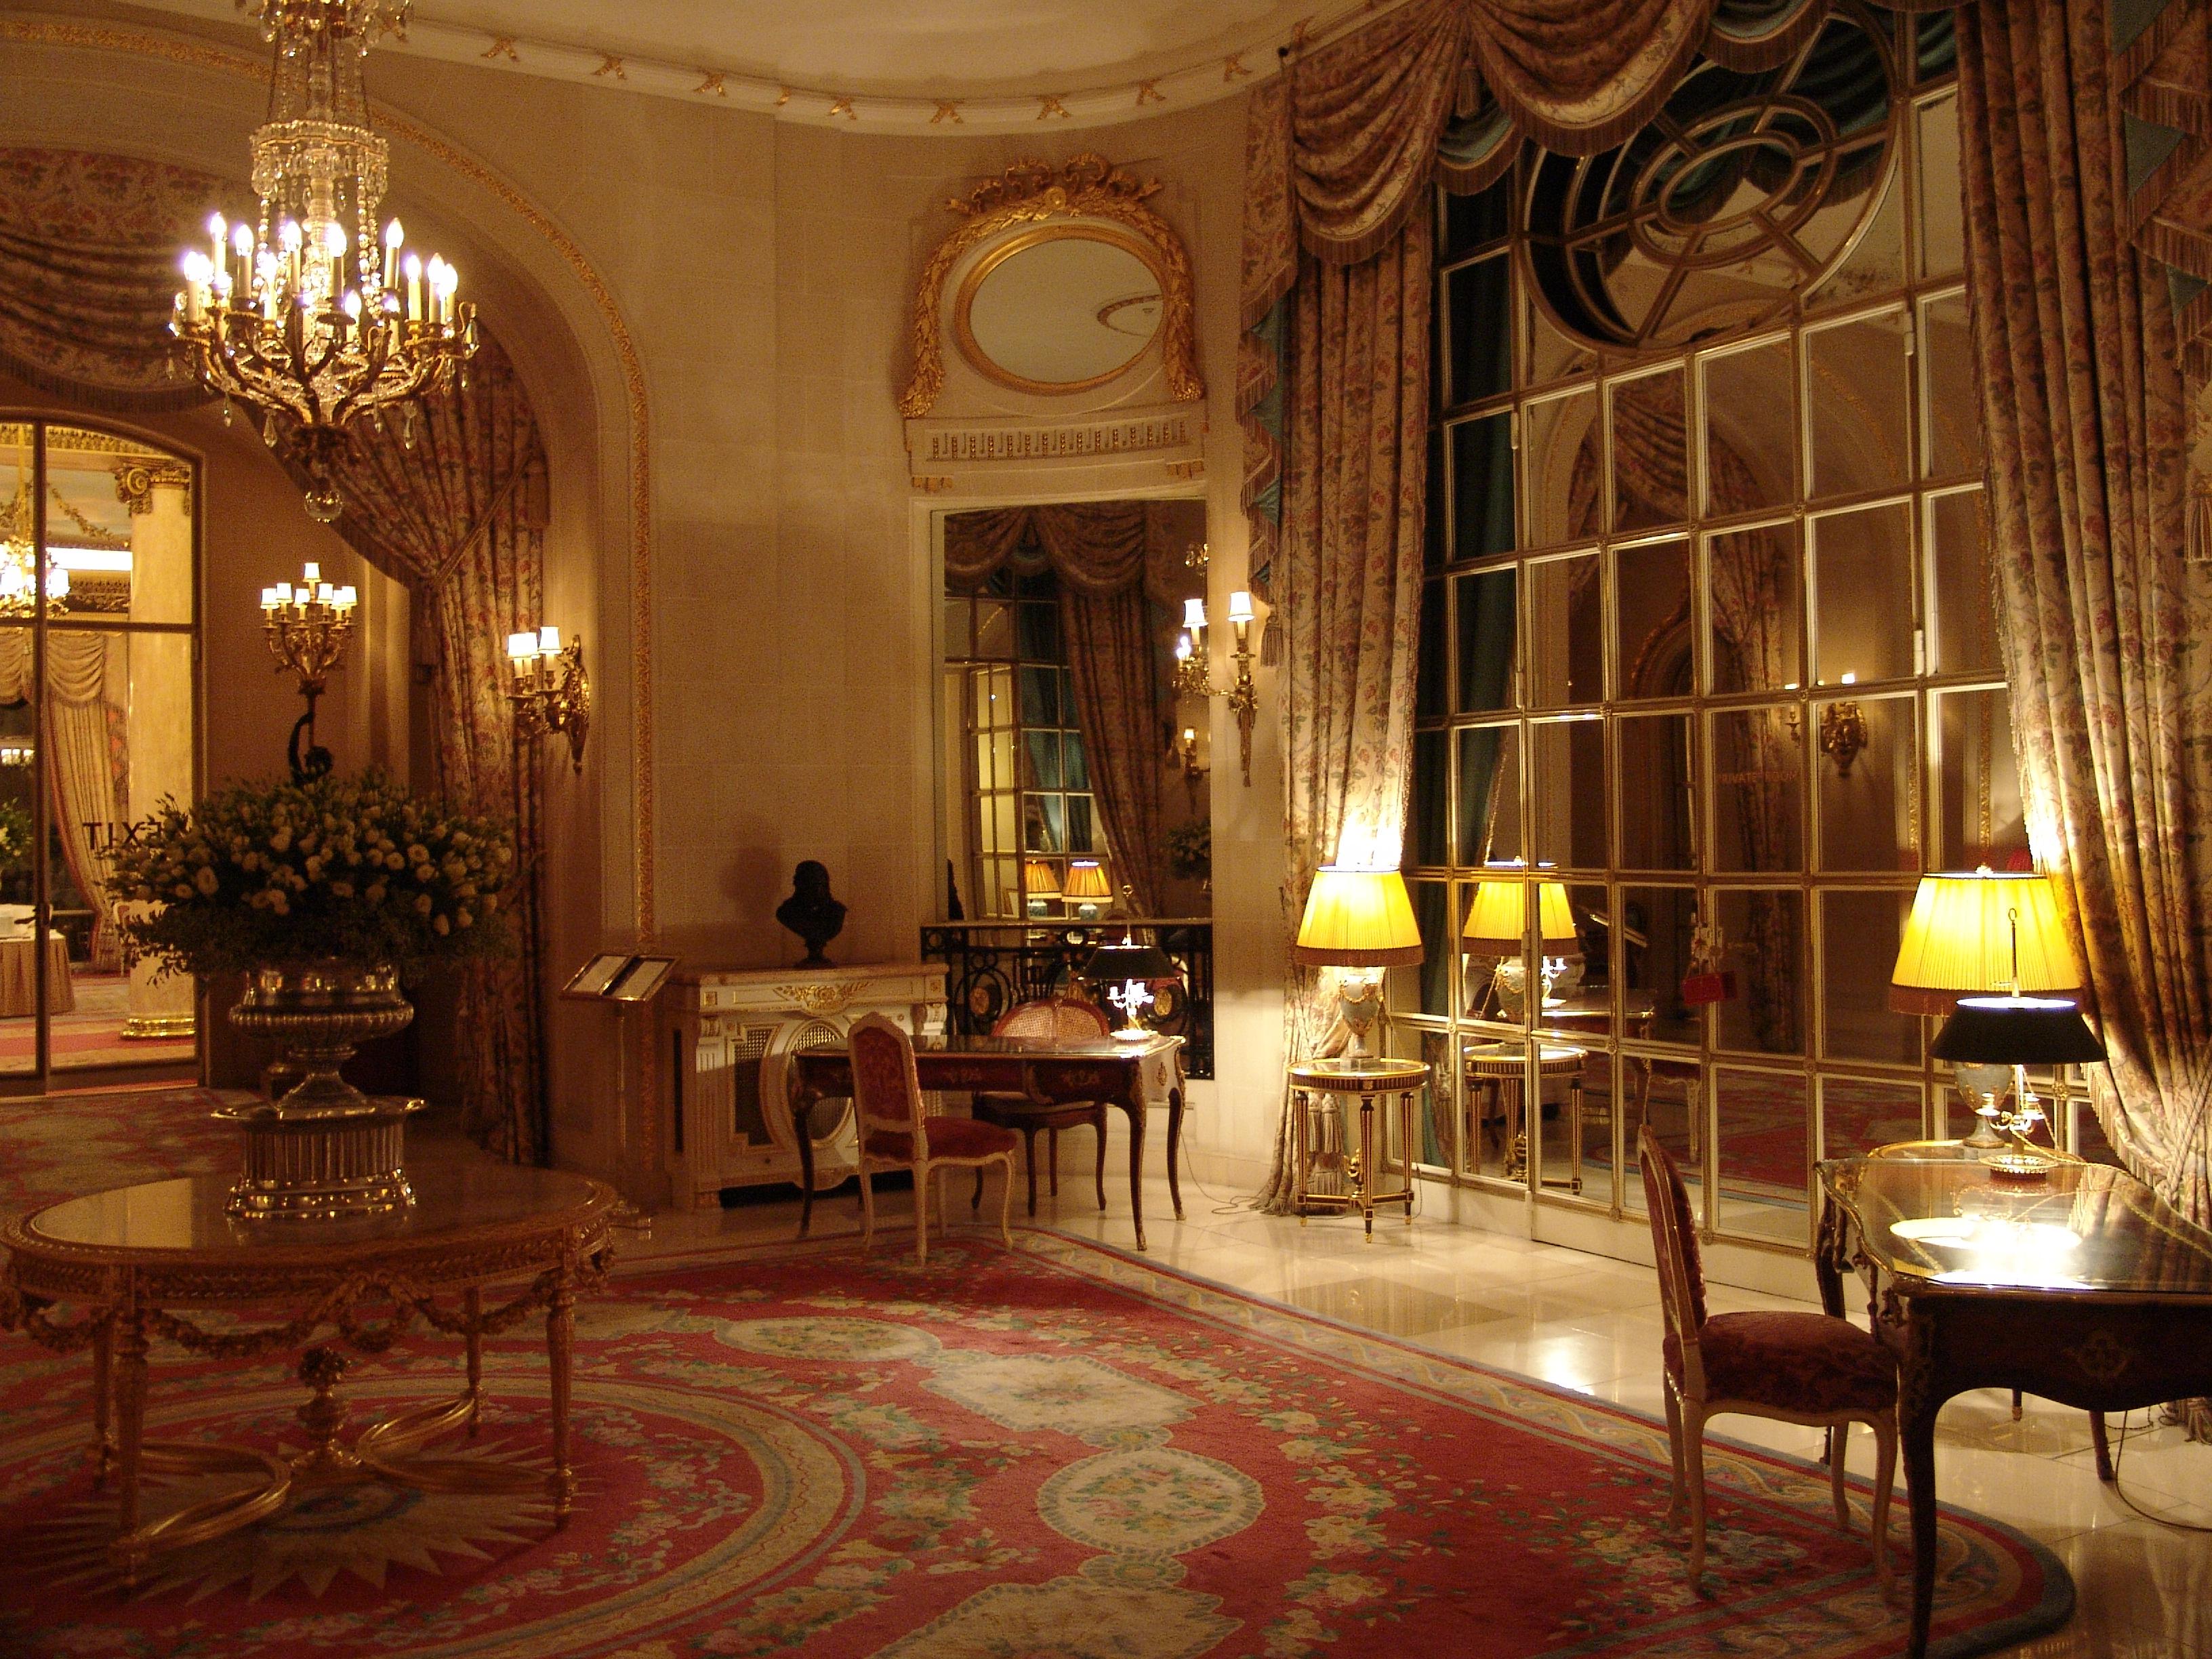 Goya Dress - Rooms